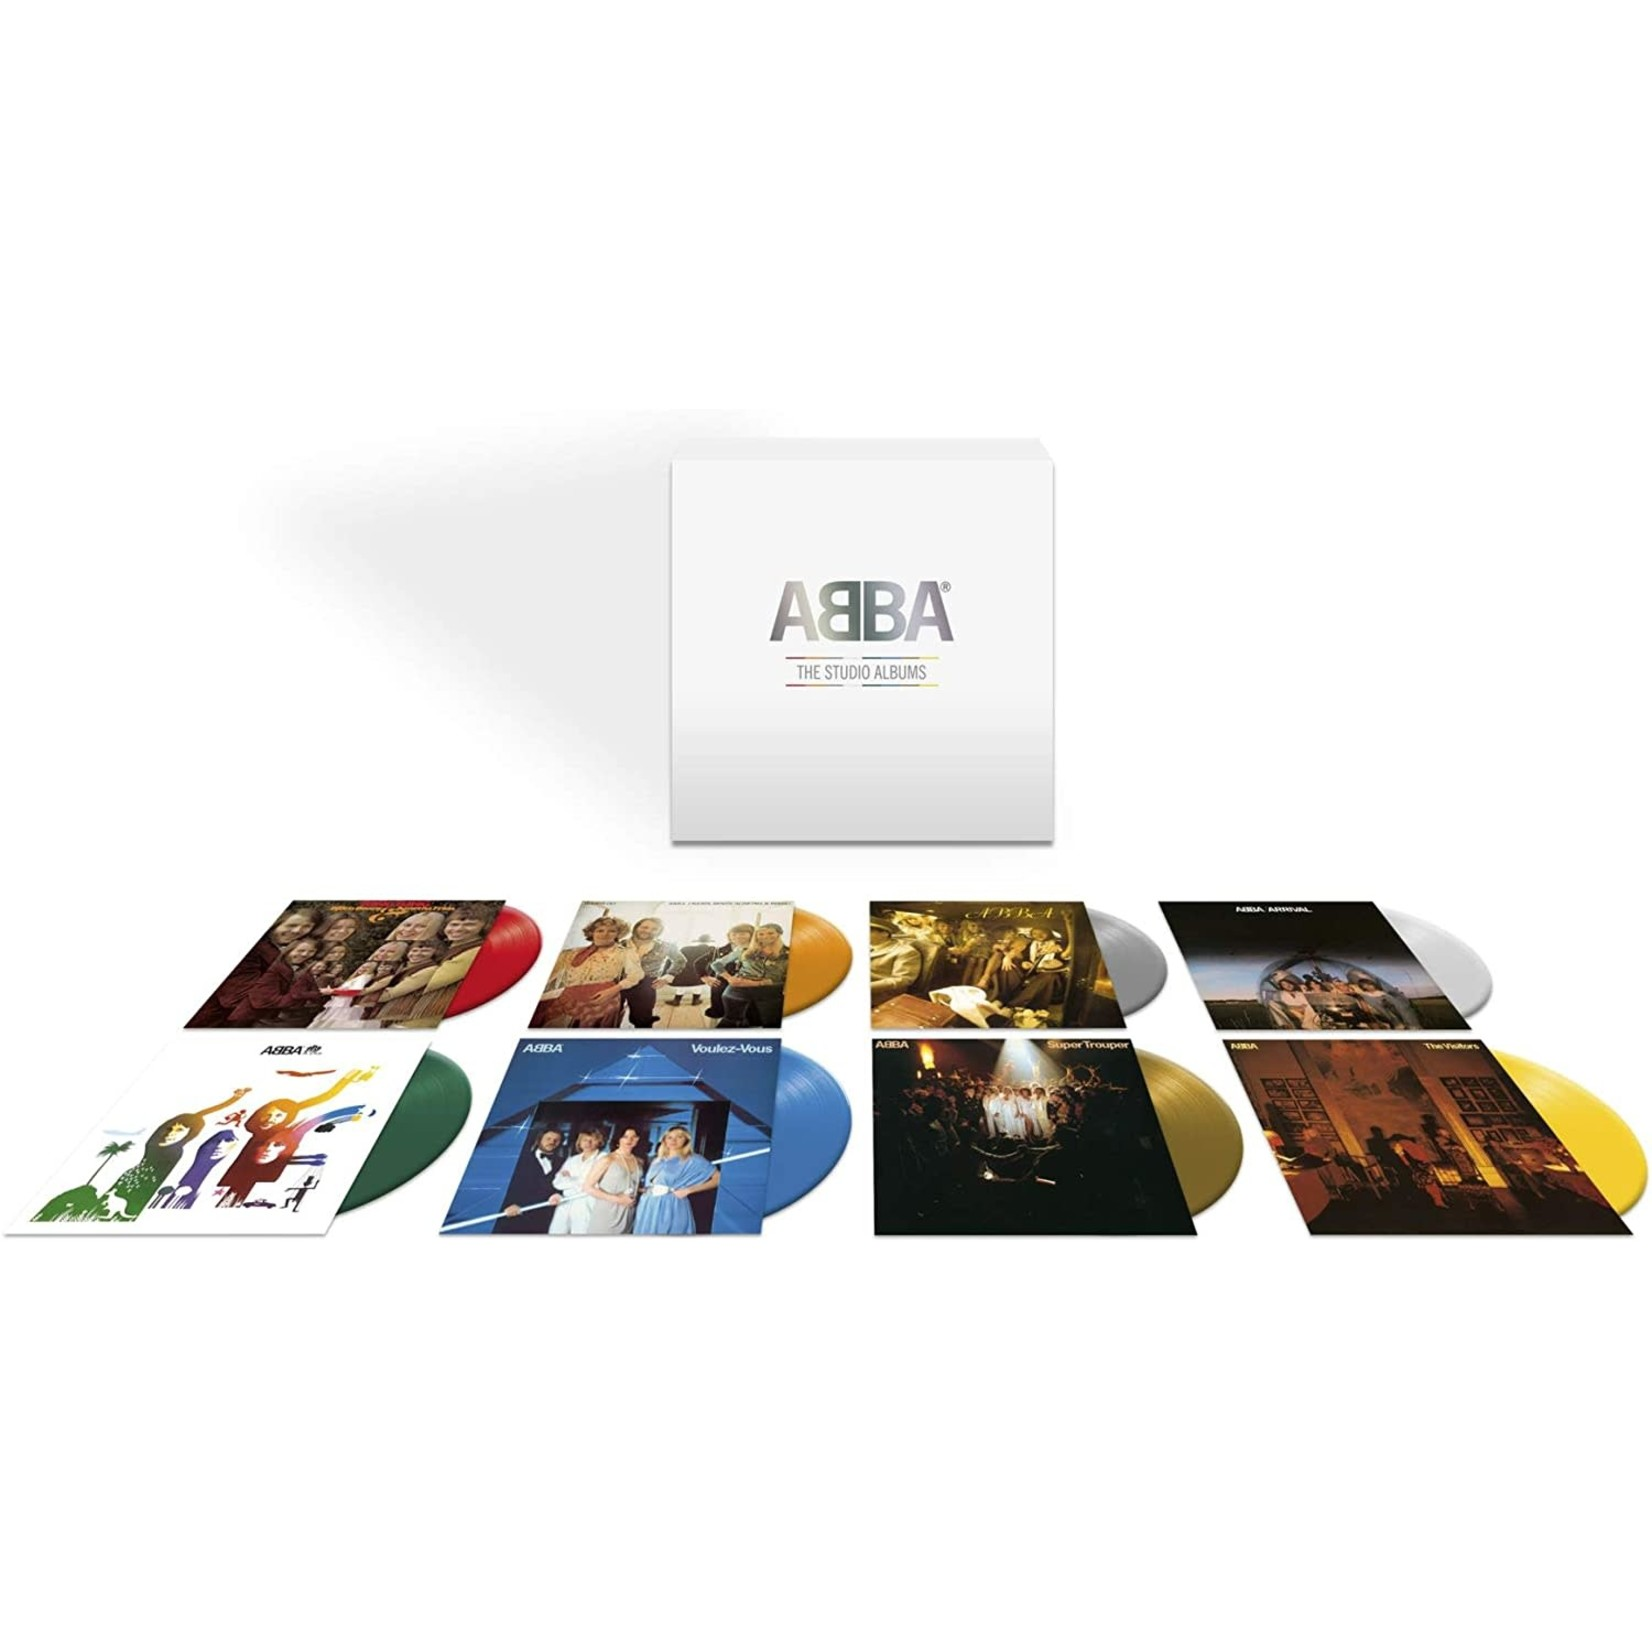 ABBA THE VINYL COLLECTION  COLOURED VINYL 8 LP SET